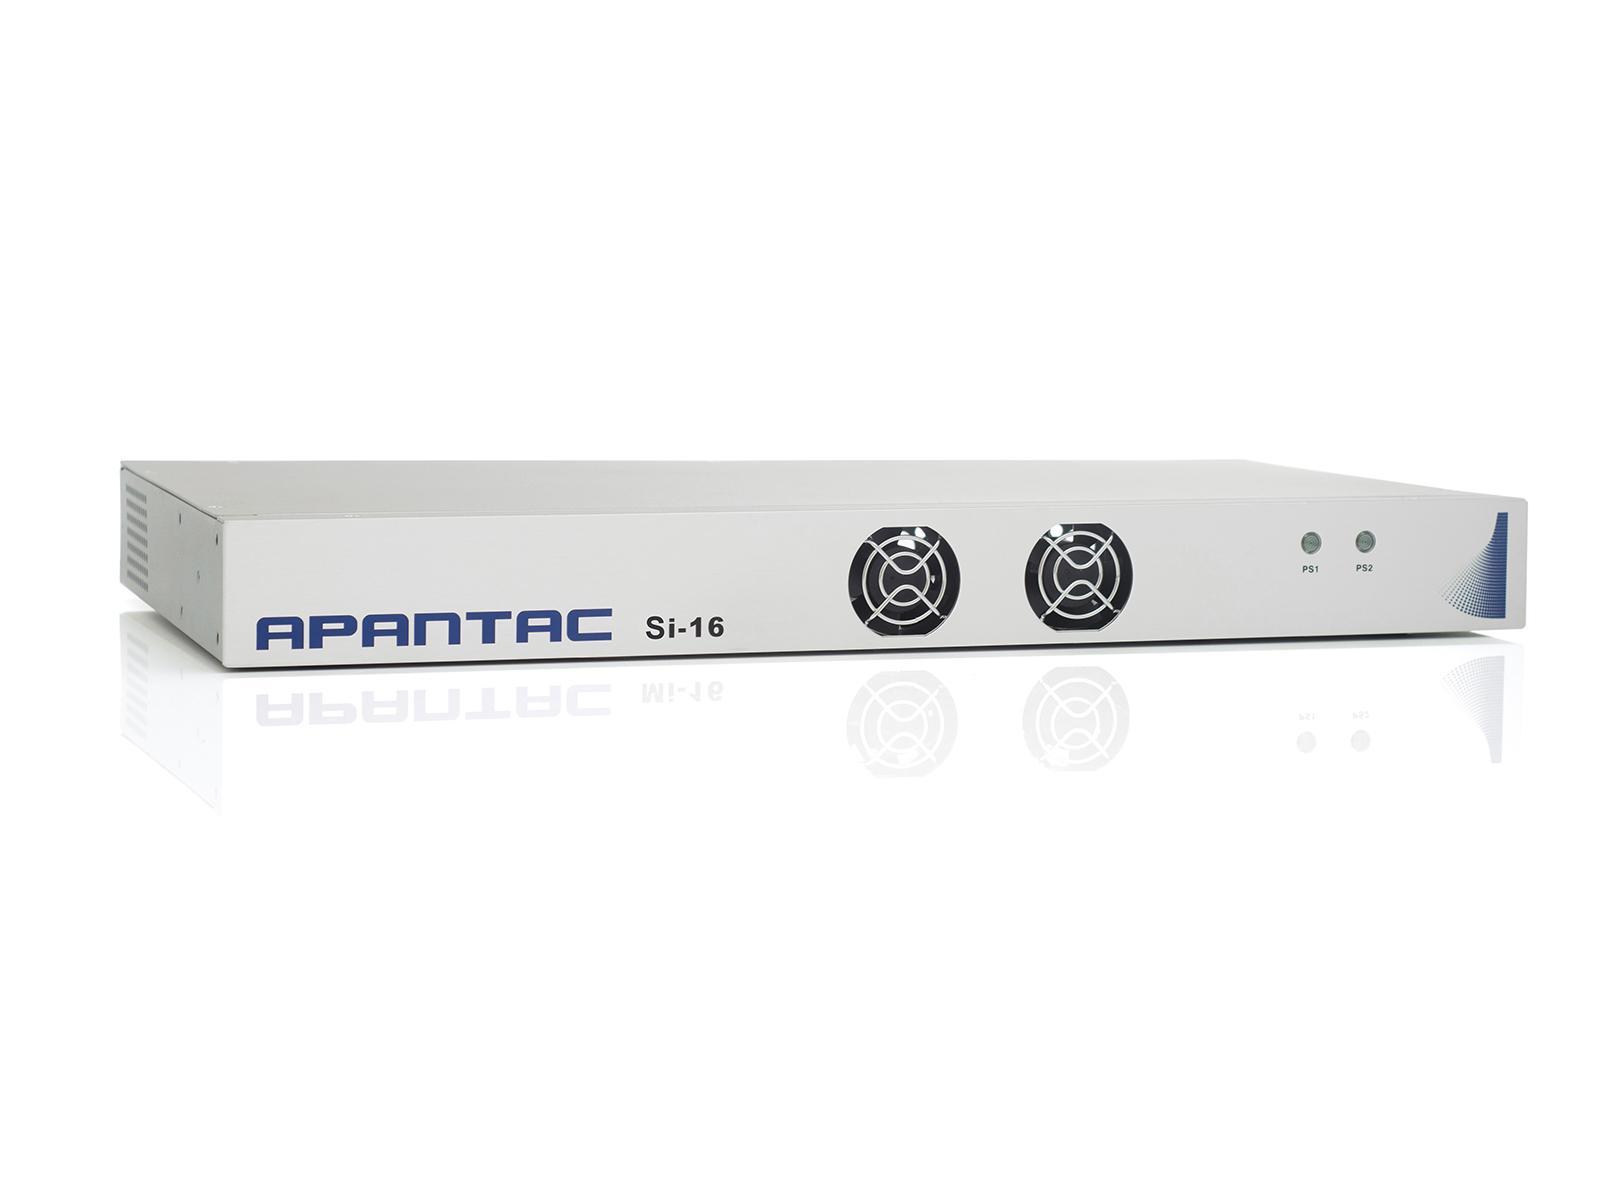 Apantac Si-16  Two 8x1 VoIP (ST 2022-6)/HDMI/SDI Multiviewer in 1 RU